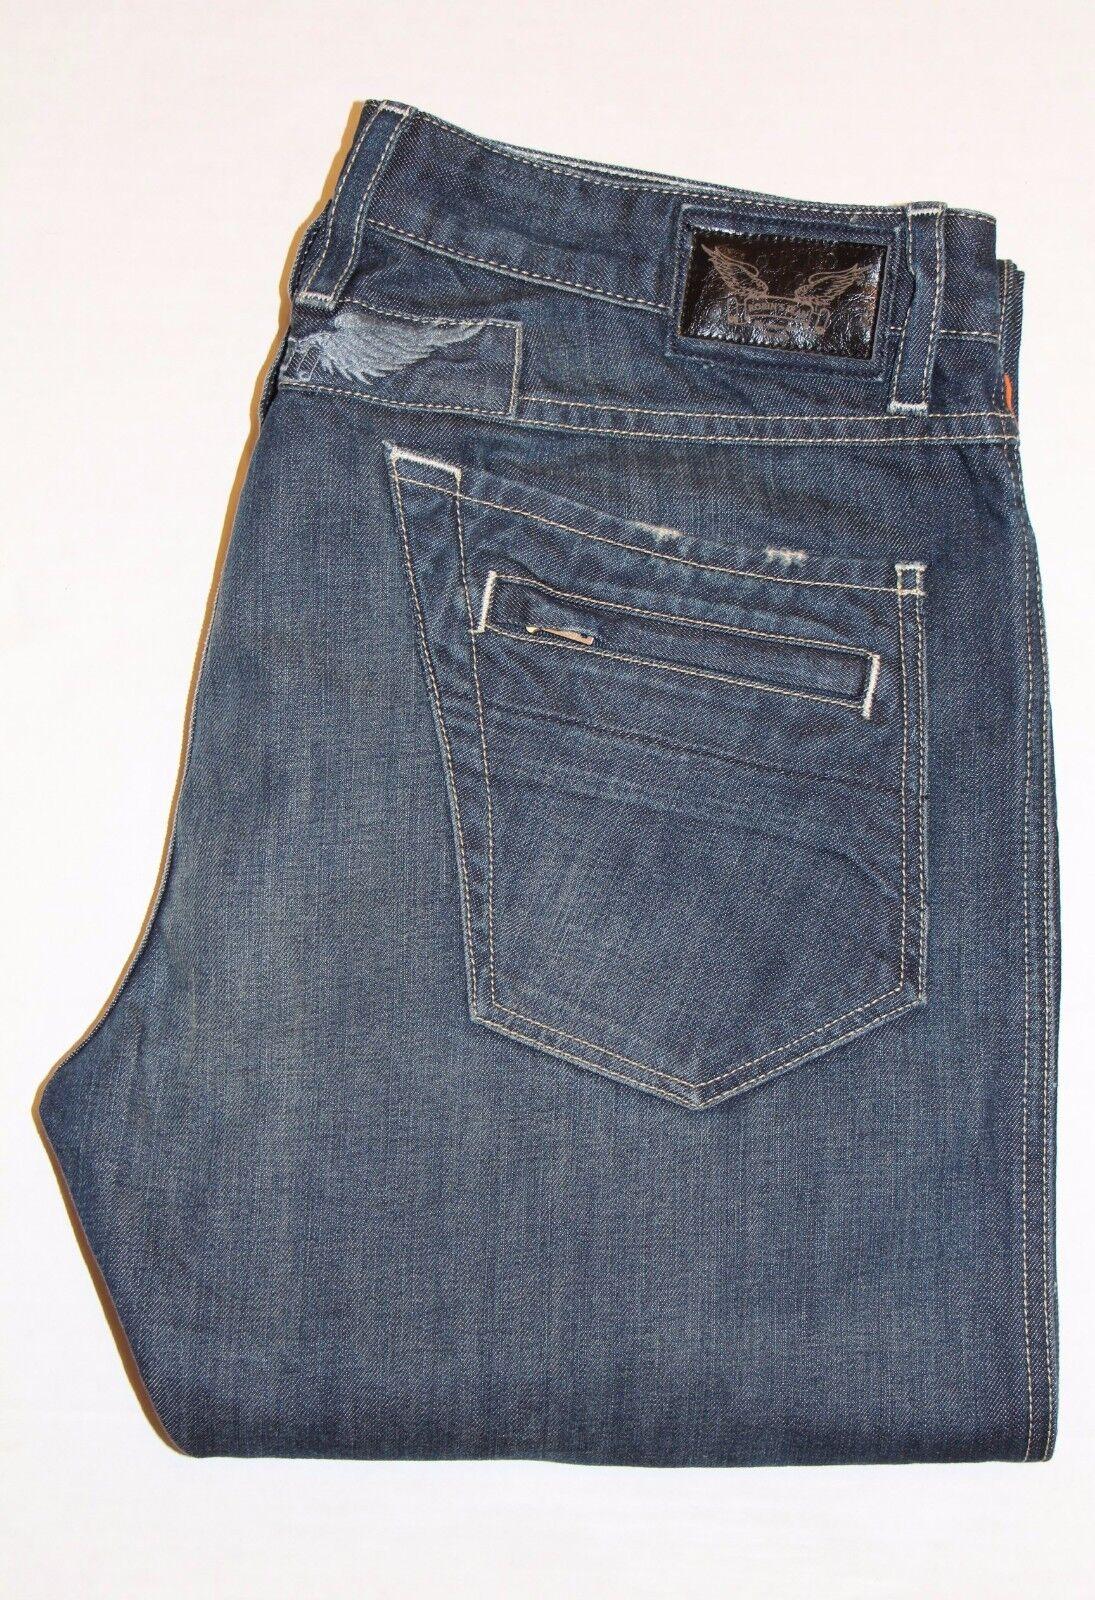 New Men's ROBIN'S JEAN sz 42 Style  D5475 MOTARD - Slim Straight Biker Jeans